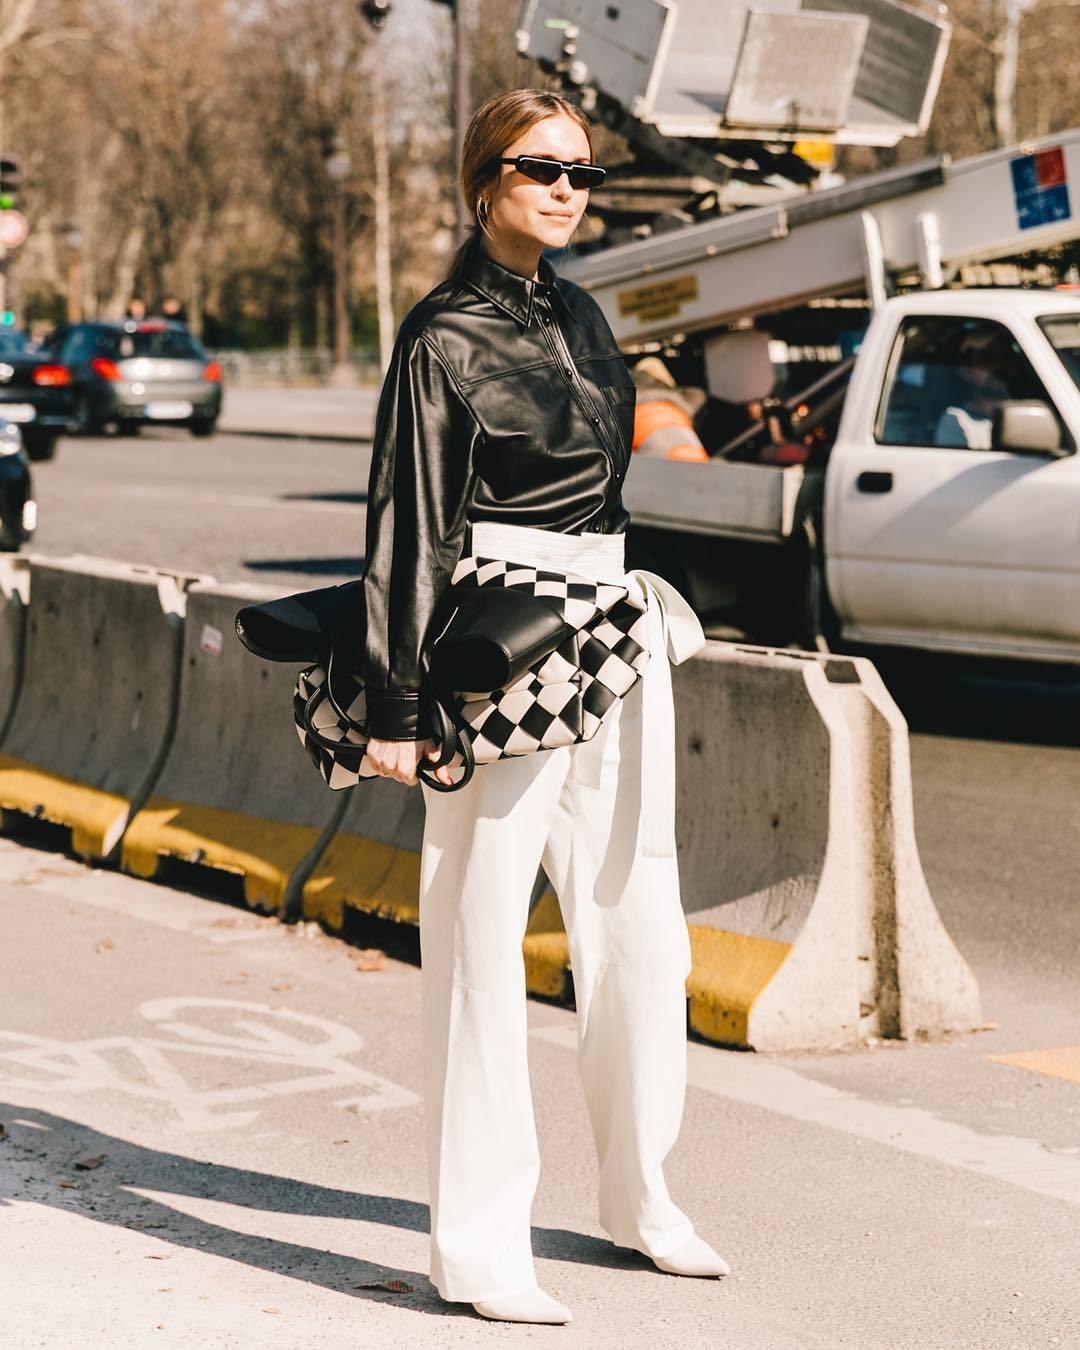 pants white pants high waisted pants loewe white boots maxi bag black jacket leather jacket